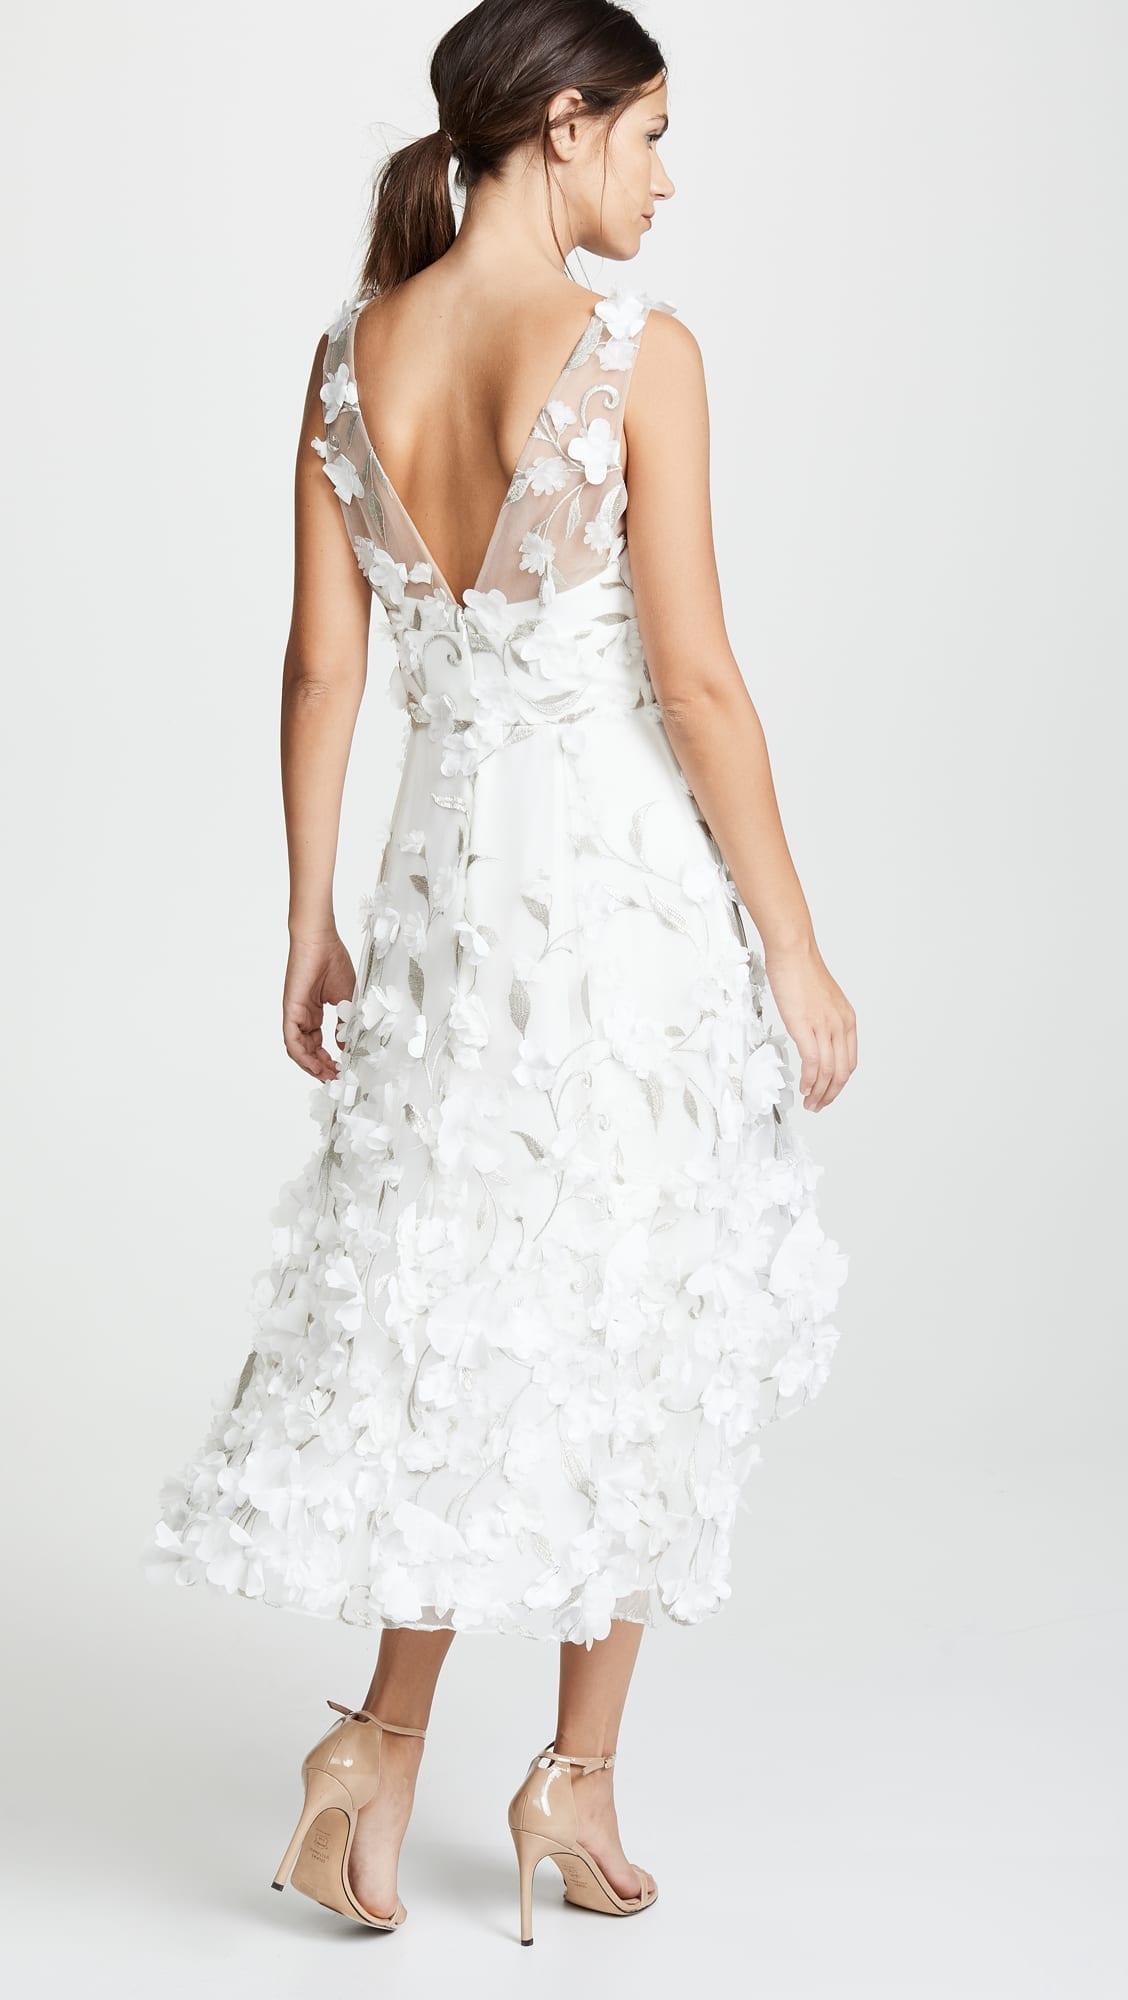 Ivory Cocktail Dresses